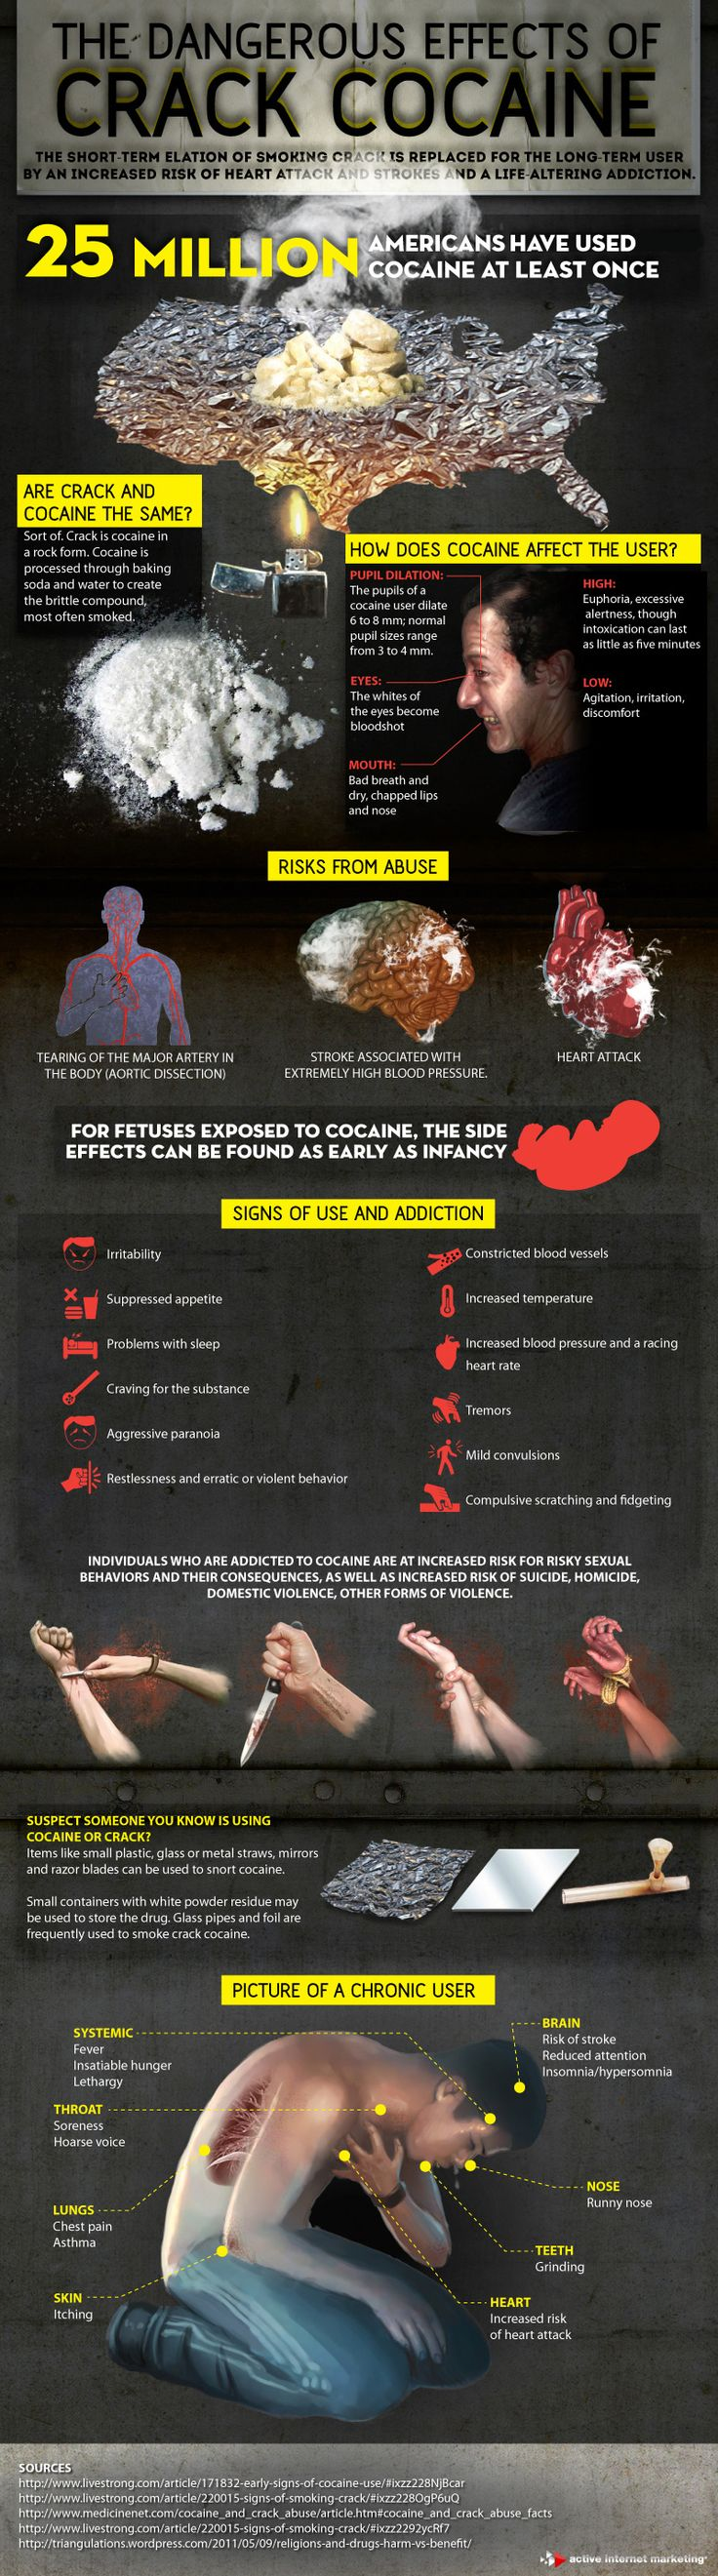 The Dangerous Effects of Crack Cocaine - from bestdrugrehabilitation.com